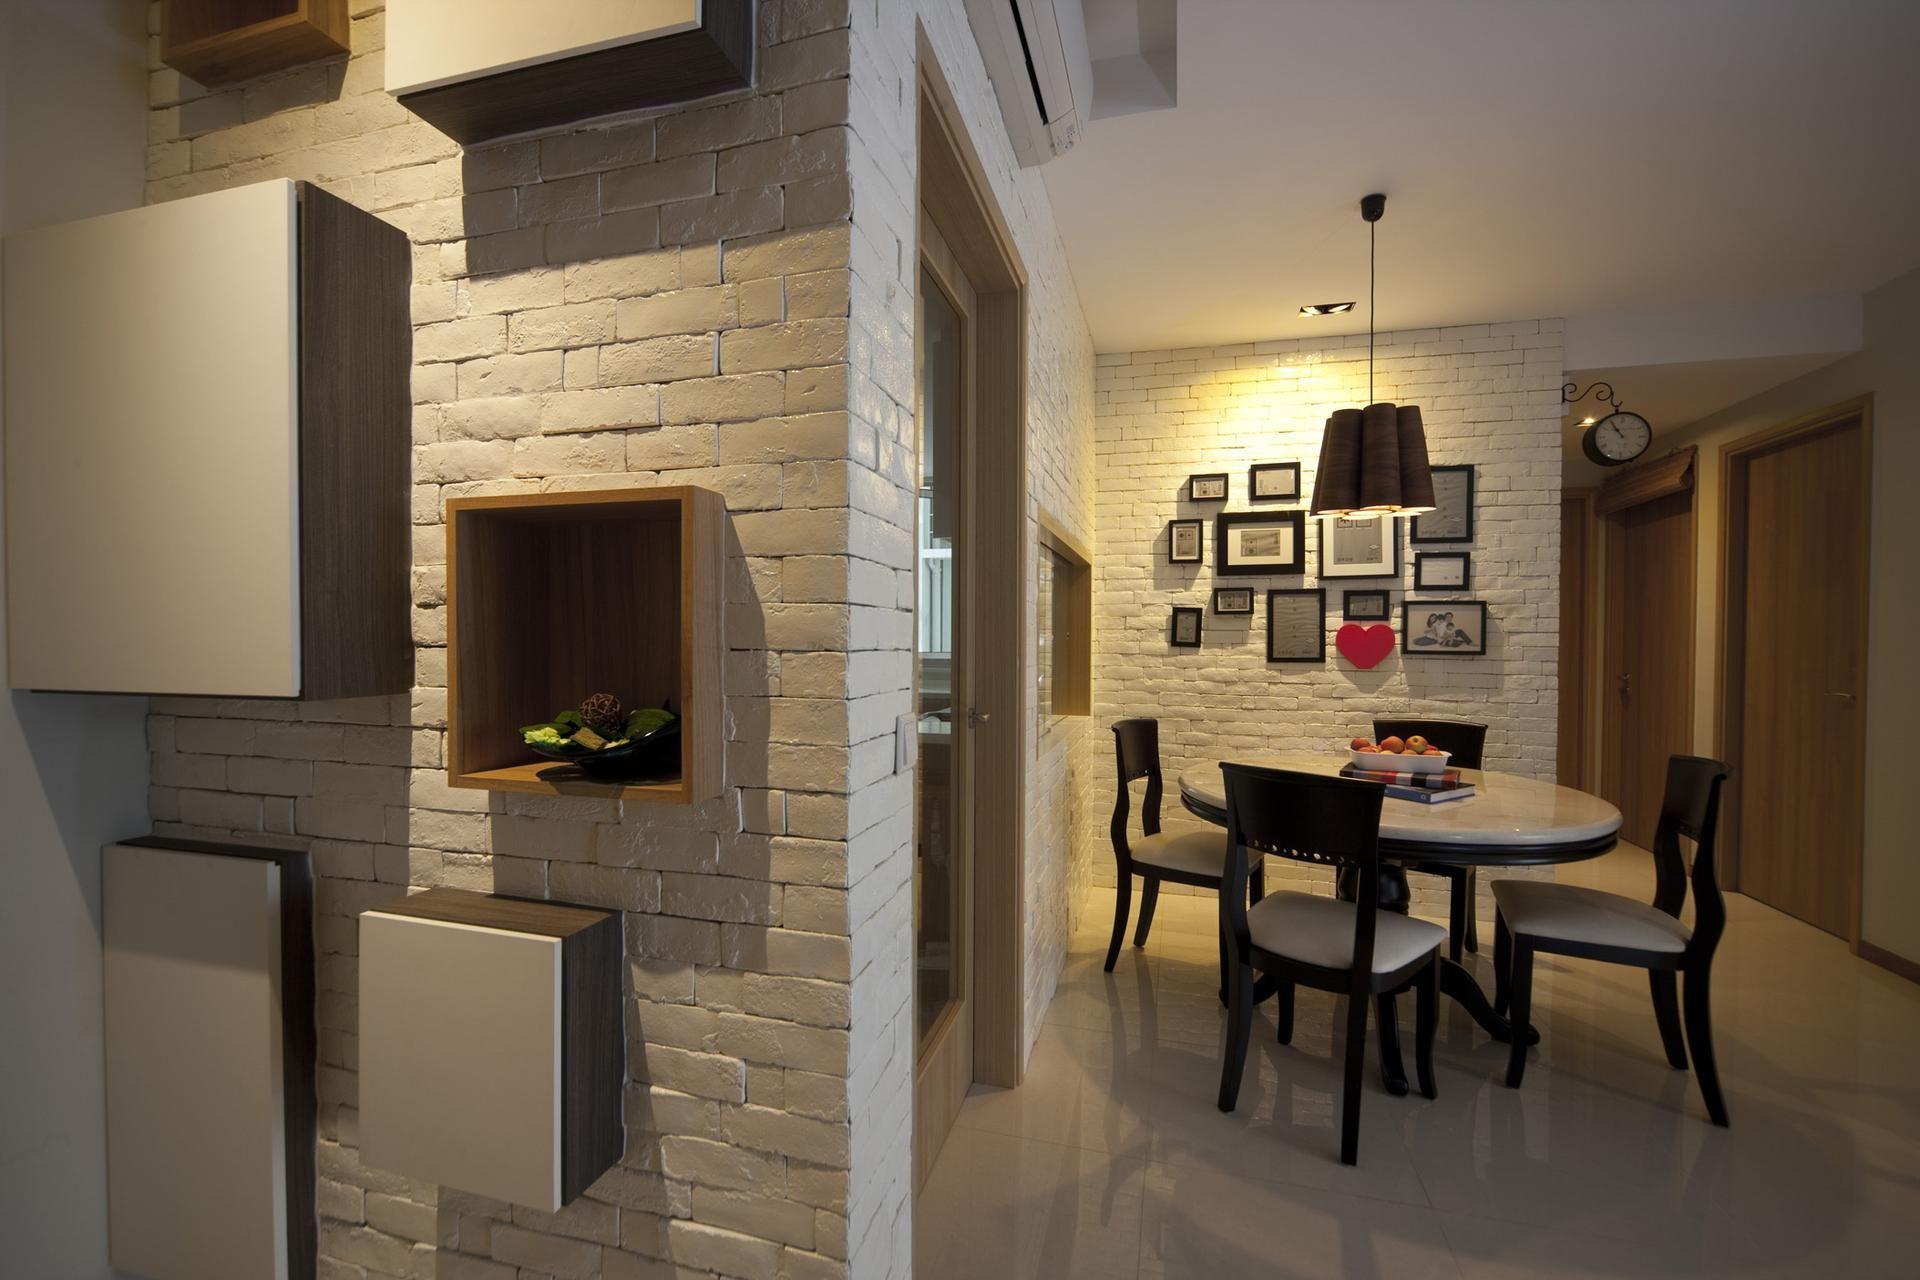 Caspian | Qanvast | Home Design, Renovation, Remodelling U0026 Furnishing Ideas